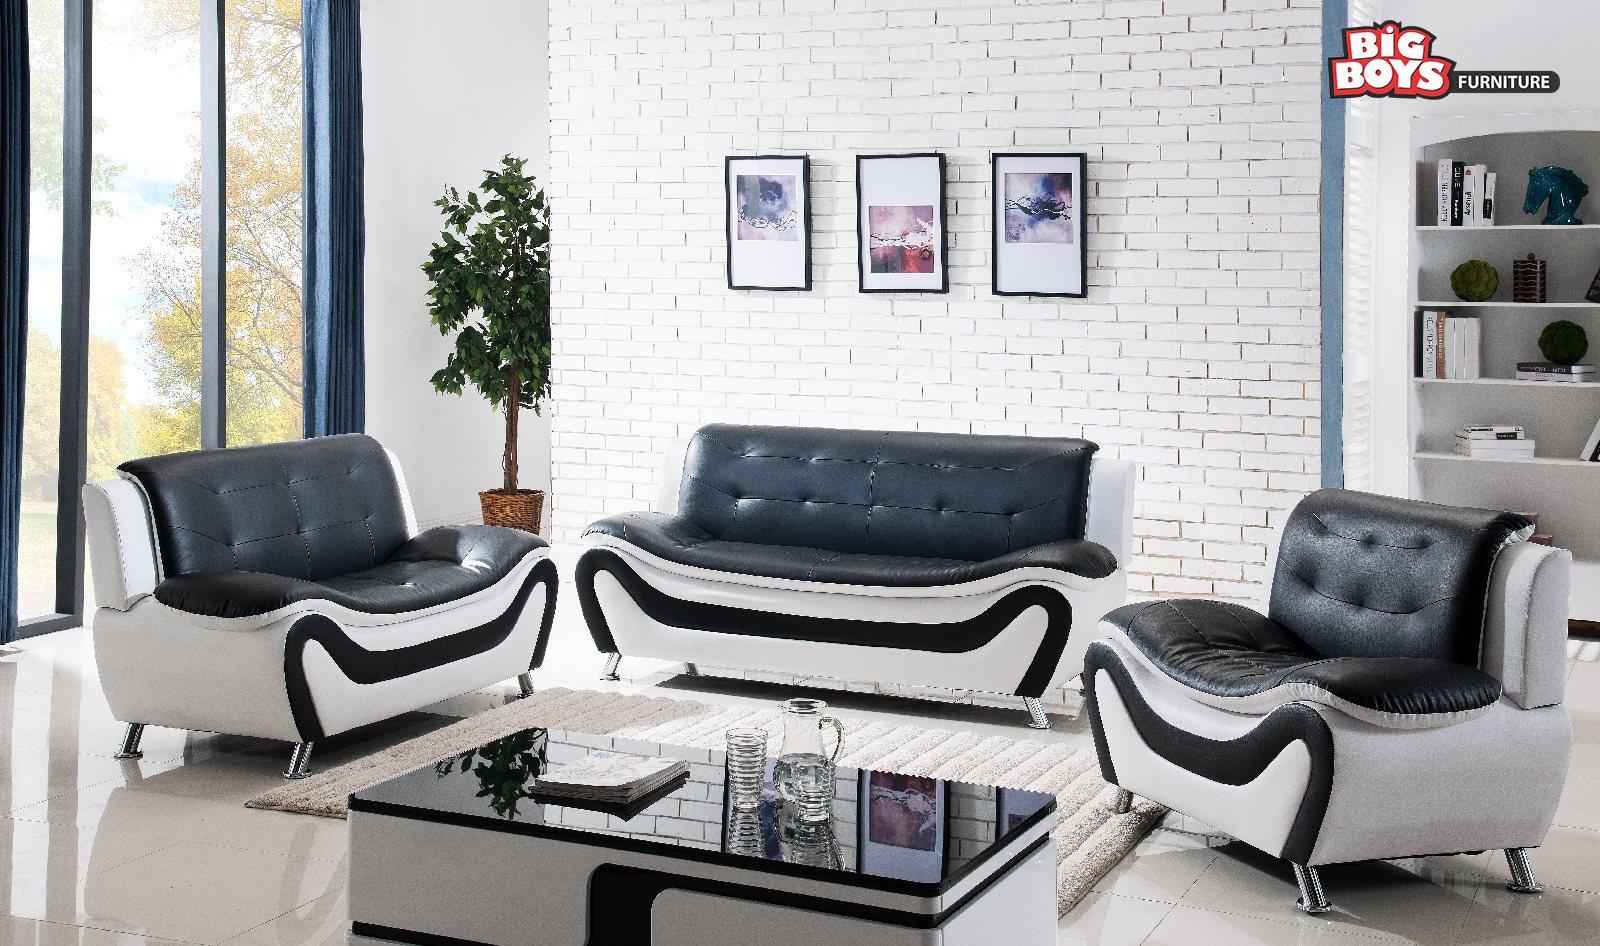 Designer sofa sets at best prices available;e at Big Boys Furniture Delta/Surrey